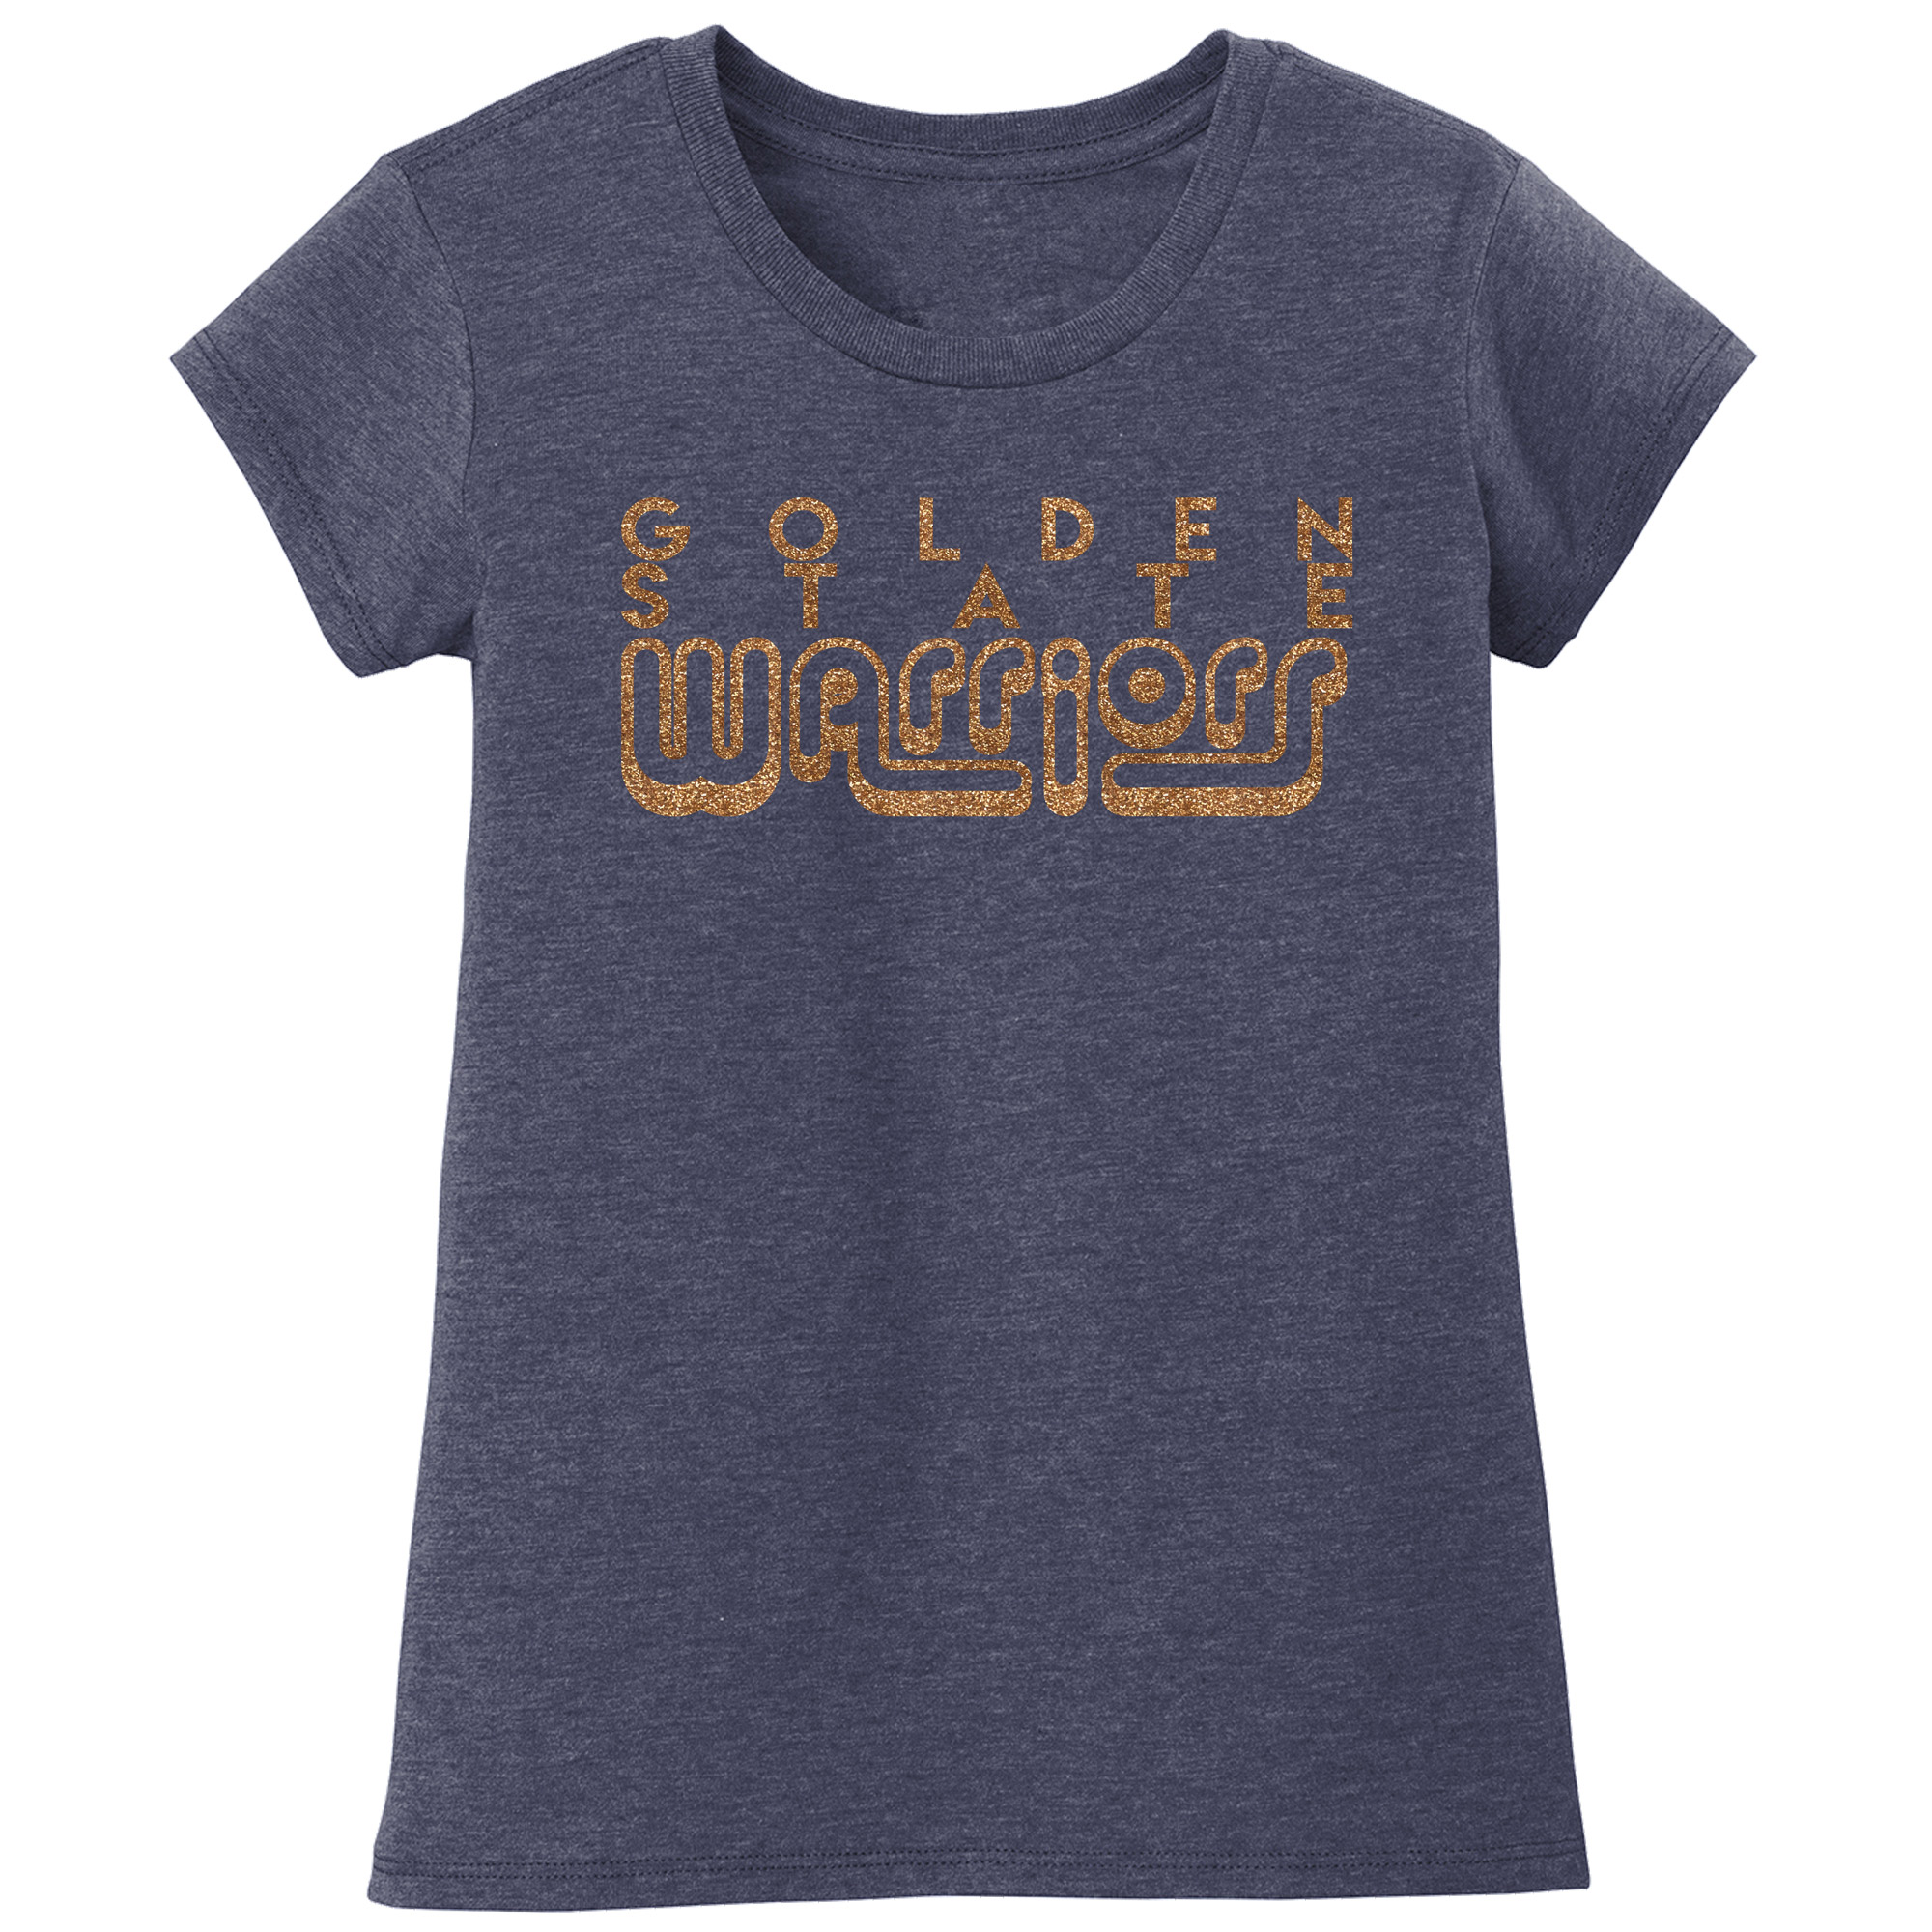 Golden State Warriors Girls Youth Sugar Coat T-Shirt - Blue